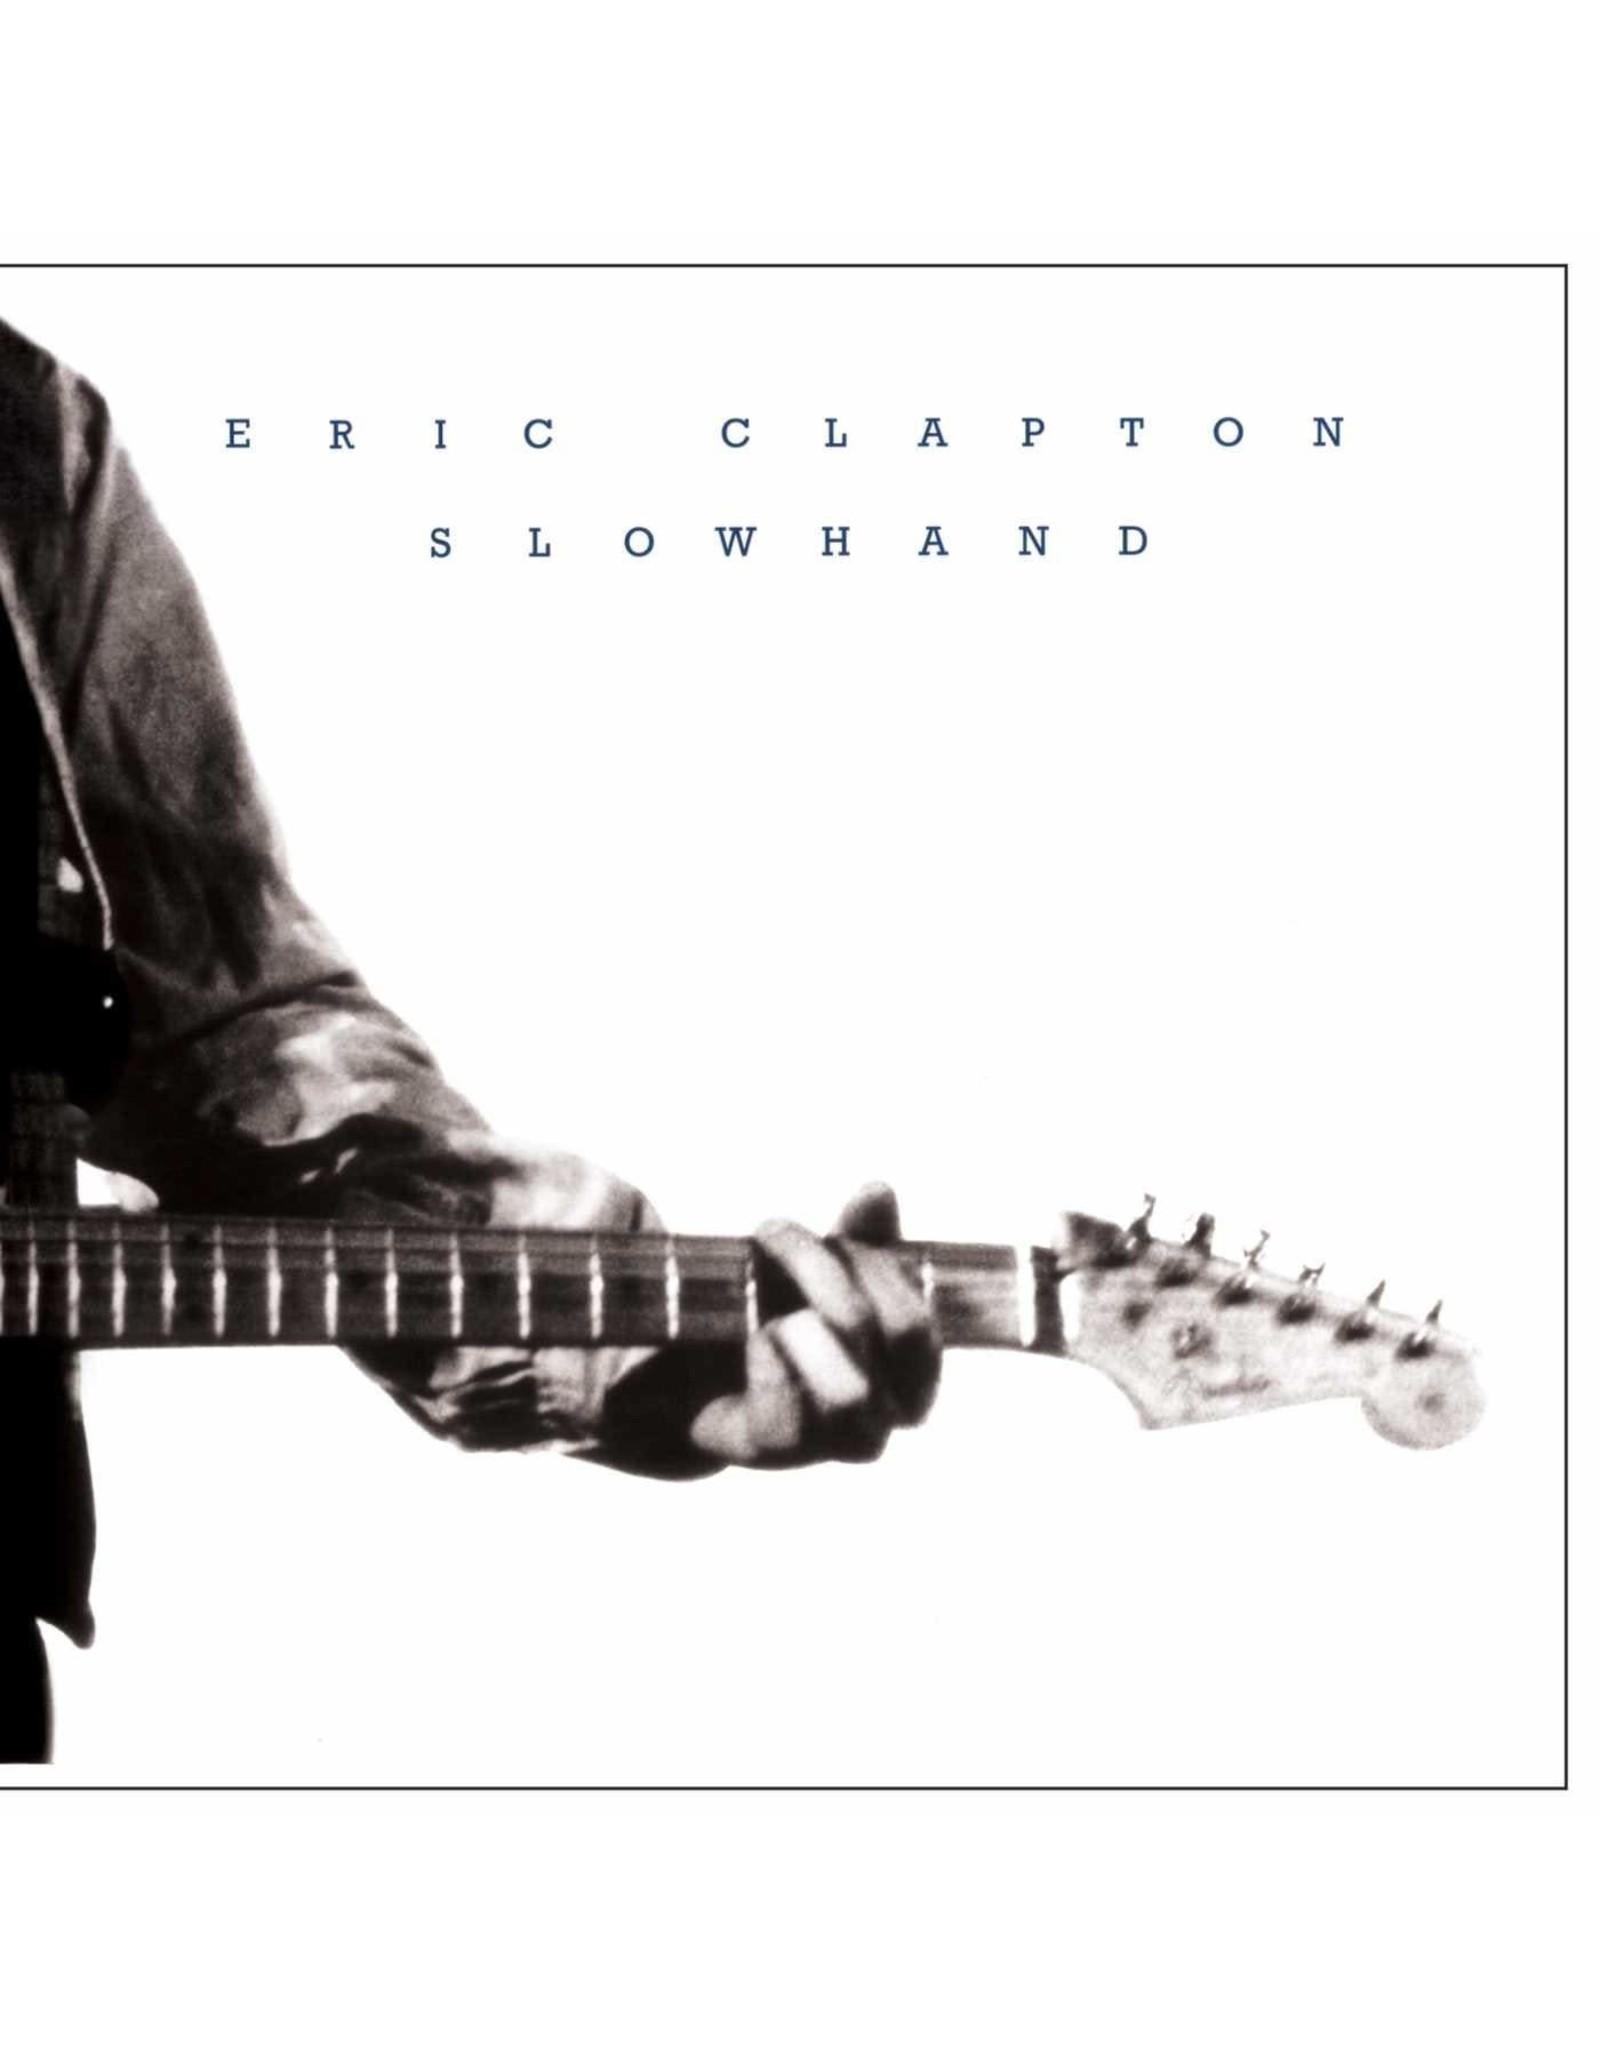 Eric Clapton - Slowhand (35th Anniversary)